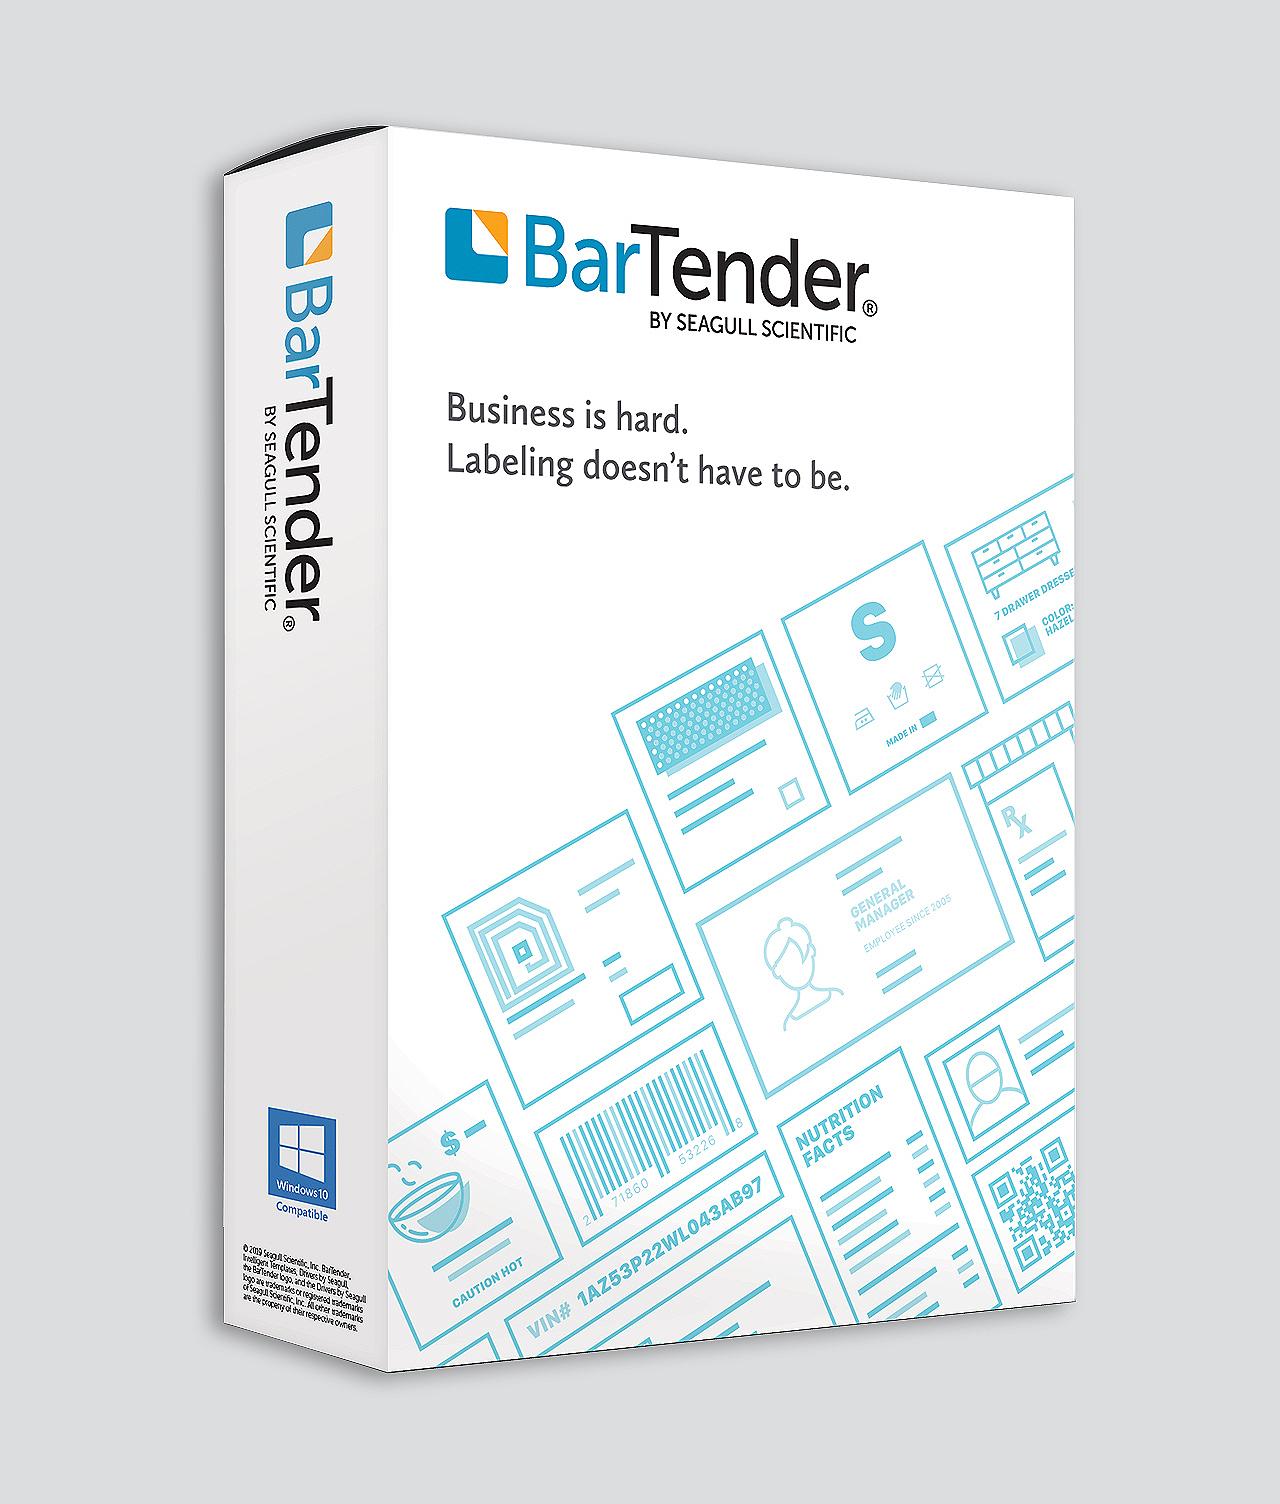 Bartender Label Design Software By Seagull Scientific Barcode Southwest